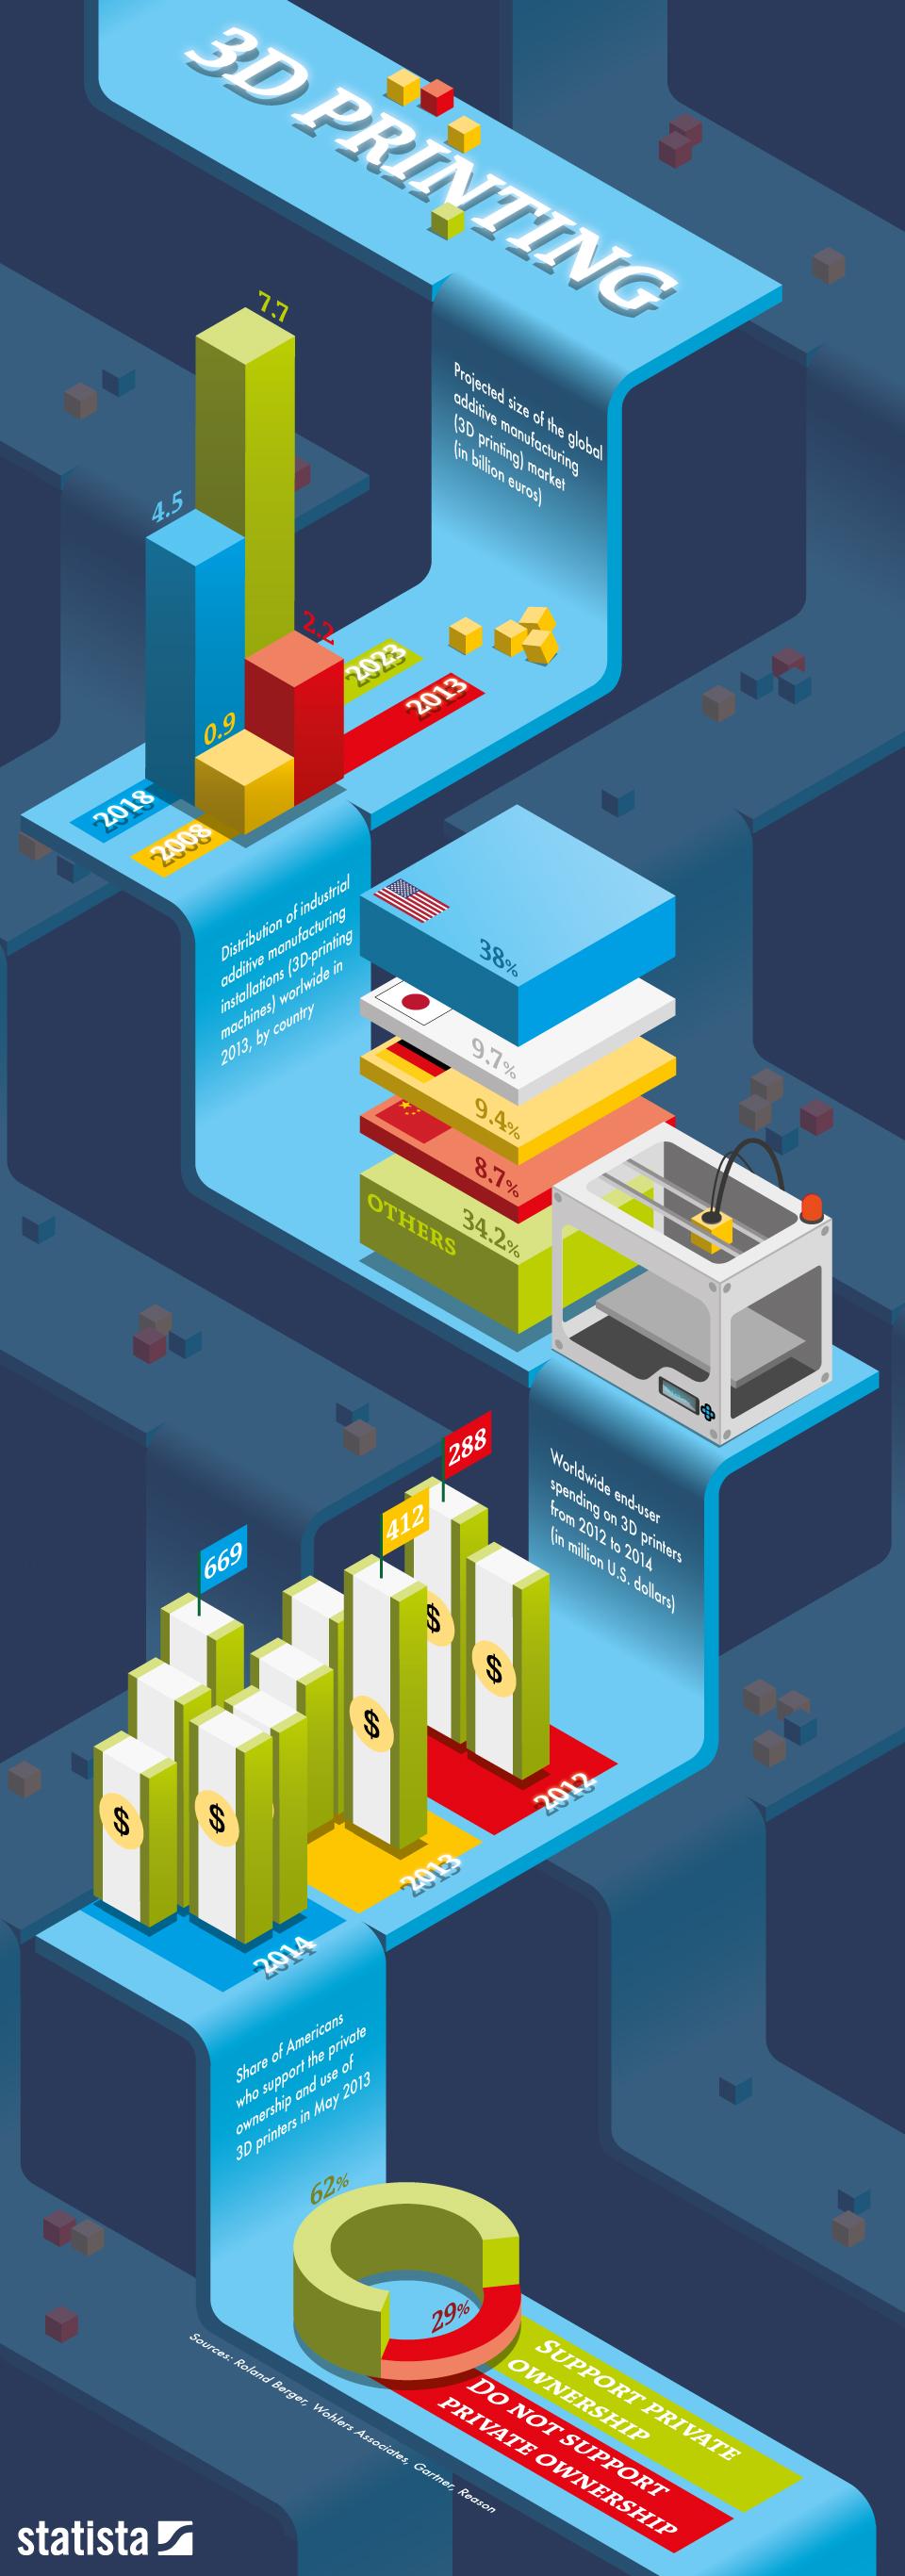 Infographic: 3D Printing | Statista